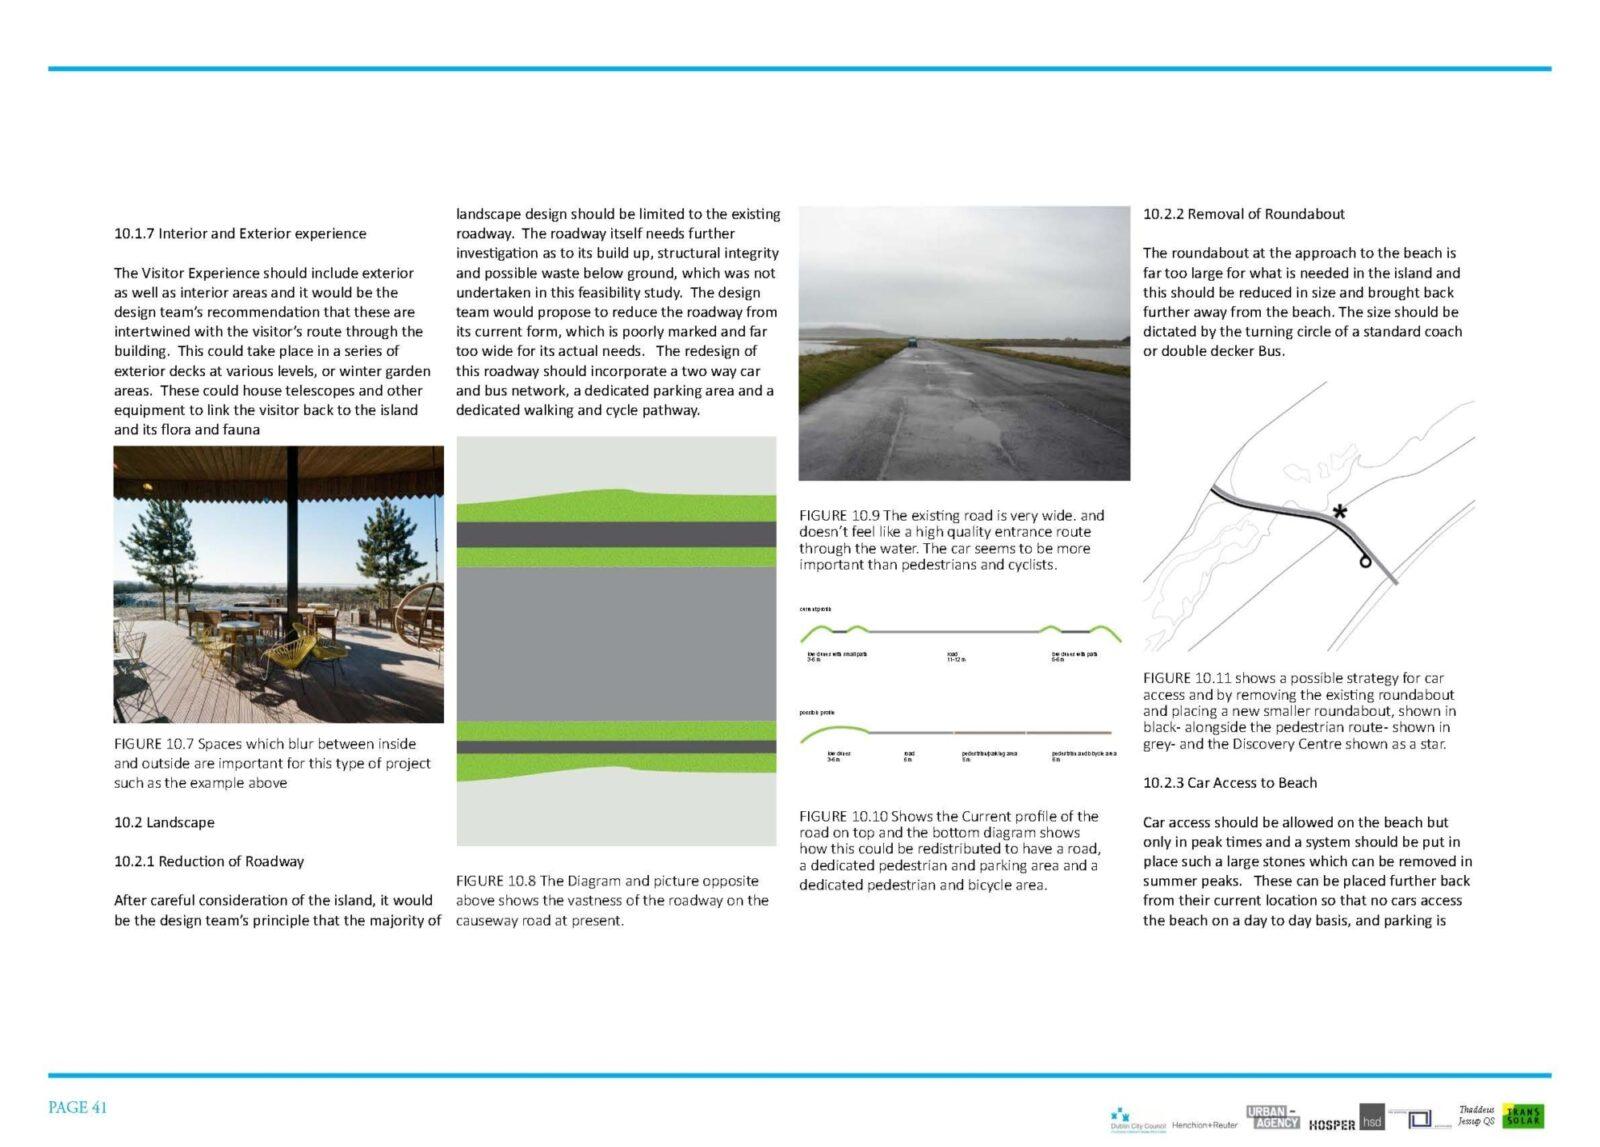 1326 Bull Island Final Report Website 5 Reduced 140815 10